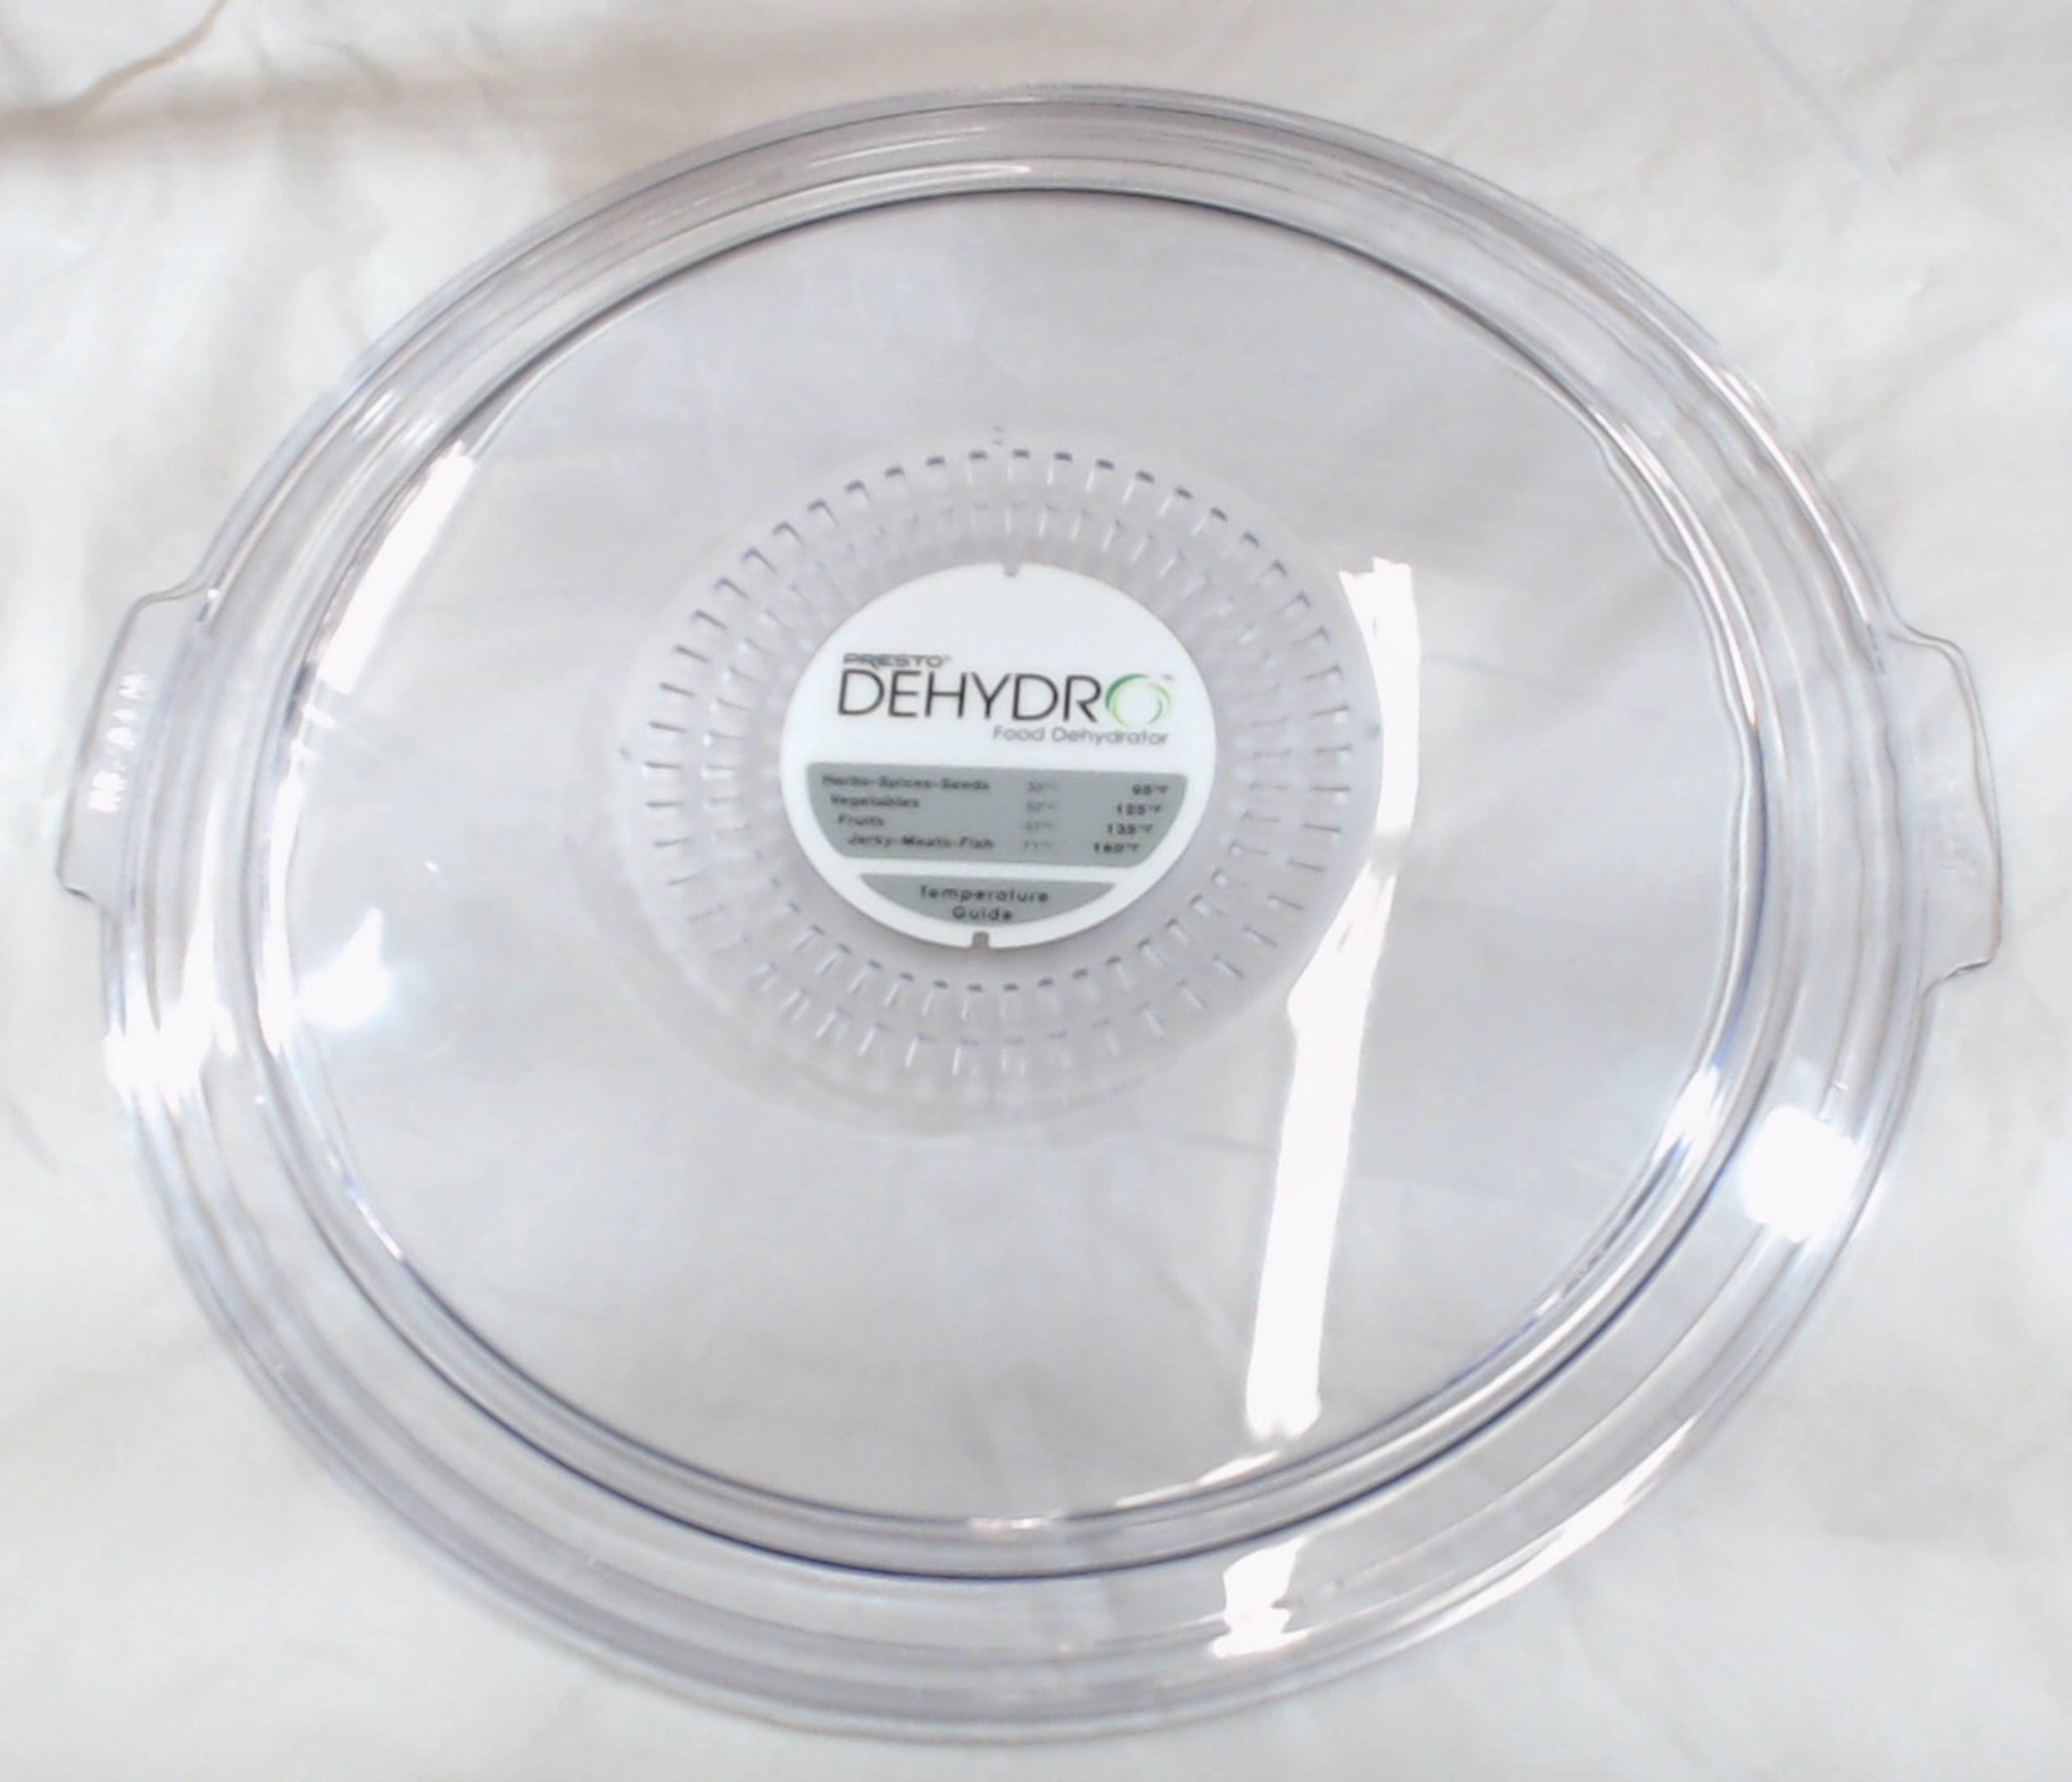 Dehydrator Cover For Dehydro Food Dehydrator Fits Presto 0630203 Models 85839